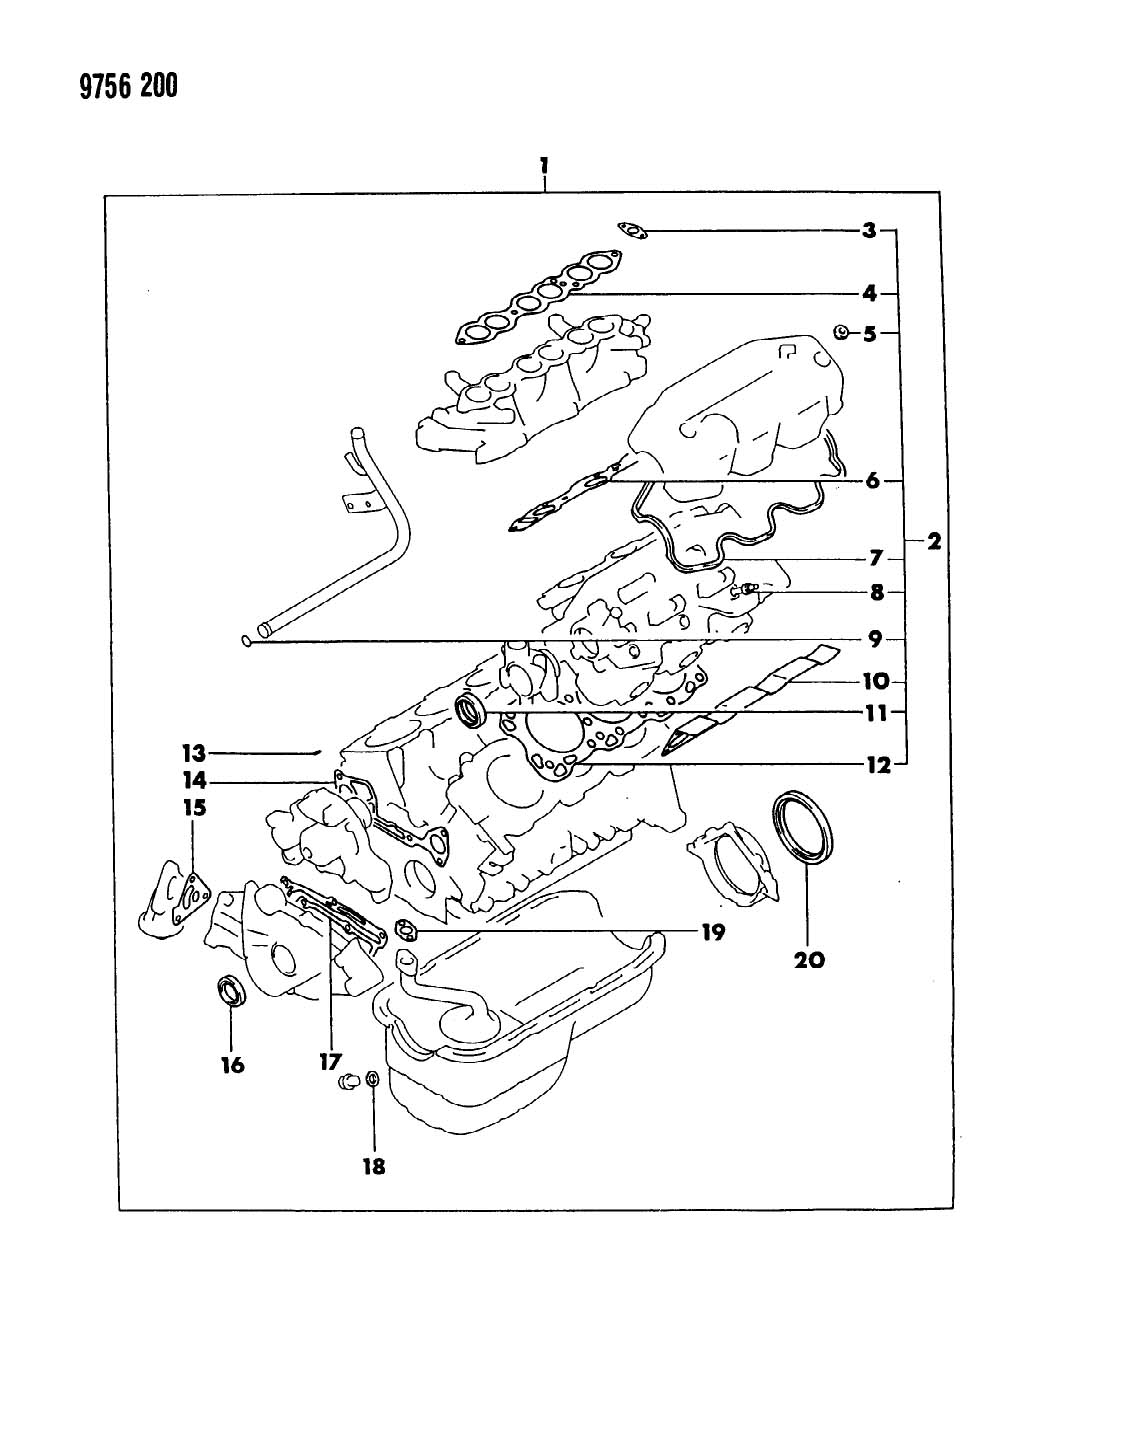 2000 Chrysler Grand Voyager Seal. Crankshaft oil. Front